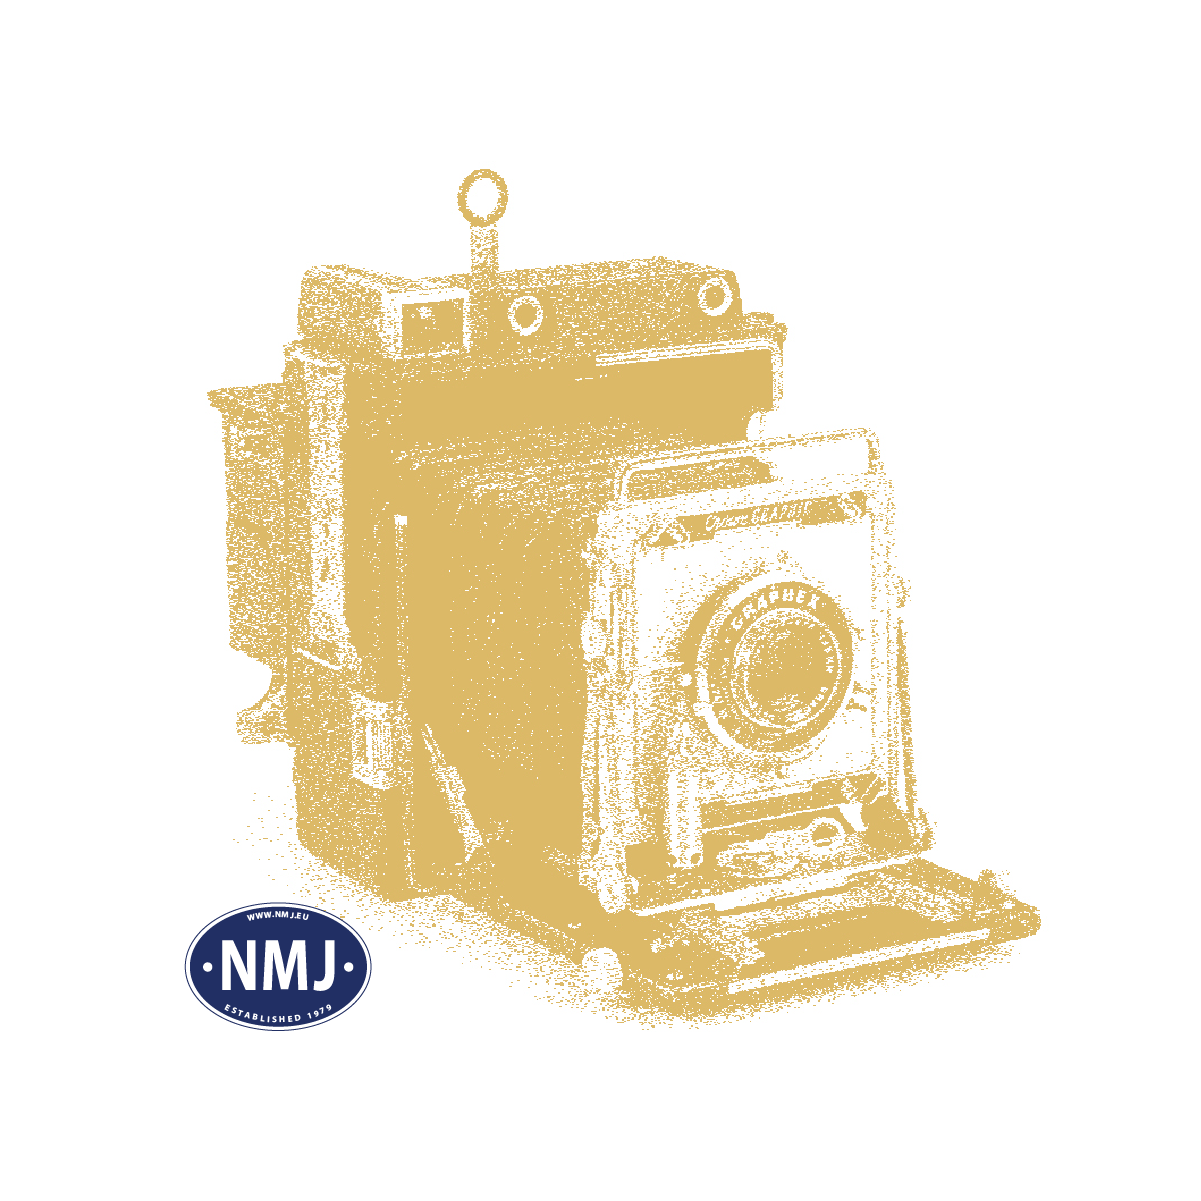 "NMJT90212 - NMJ Topline MAV M61 019 ""Classic"", DCC m/ Sound"